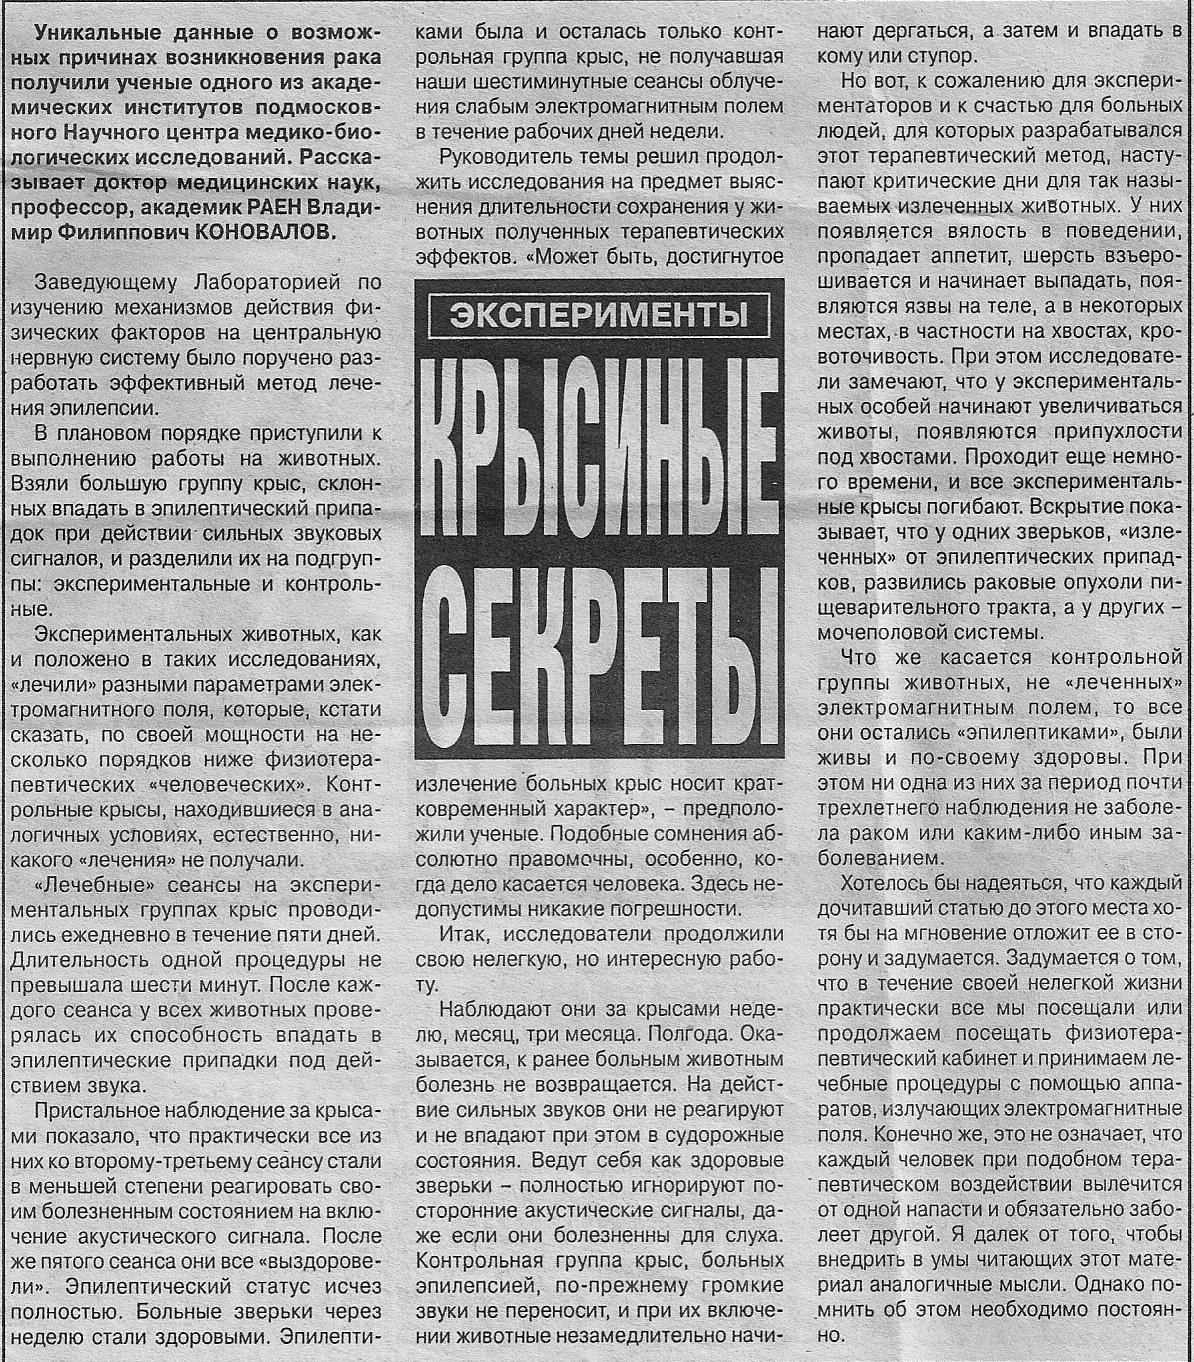 http://i5.imageban.ru/out/2017/01/29/1a24a5c31c1686c10faabc2375a6f84e.jpg